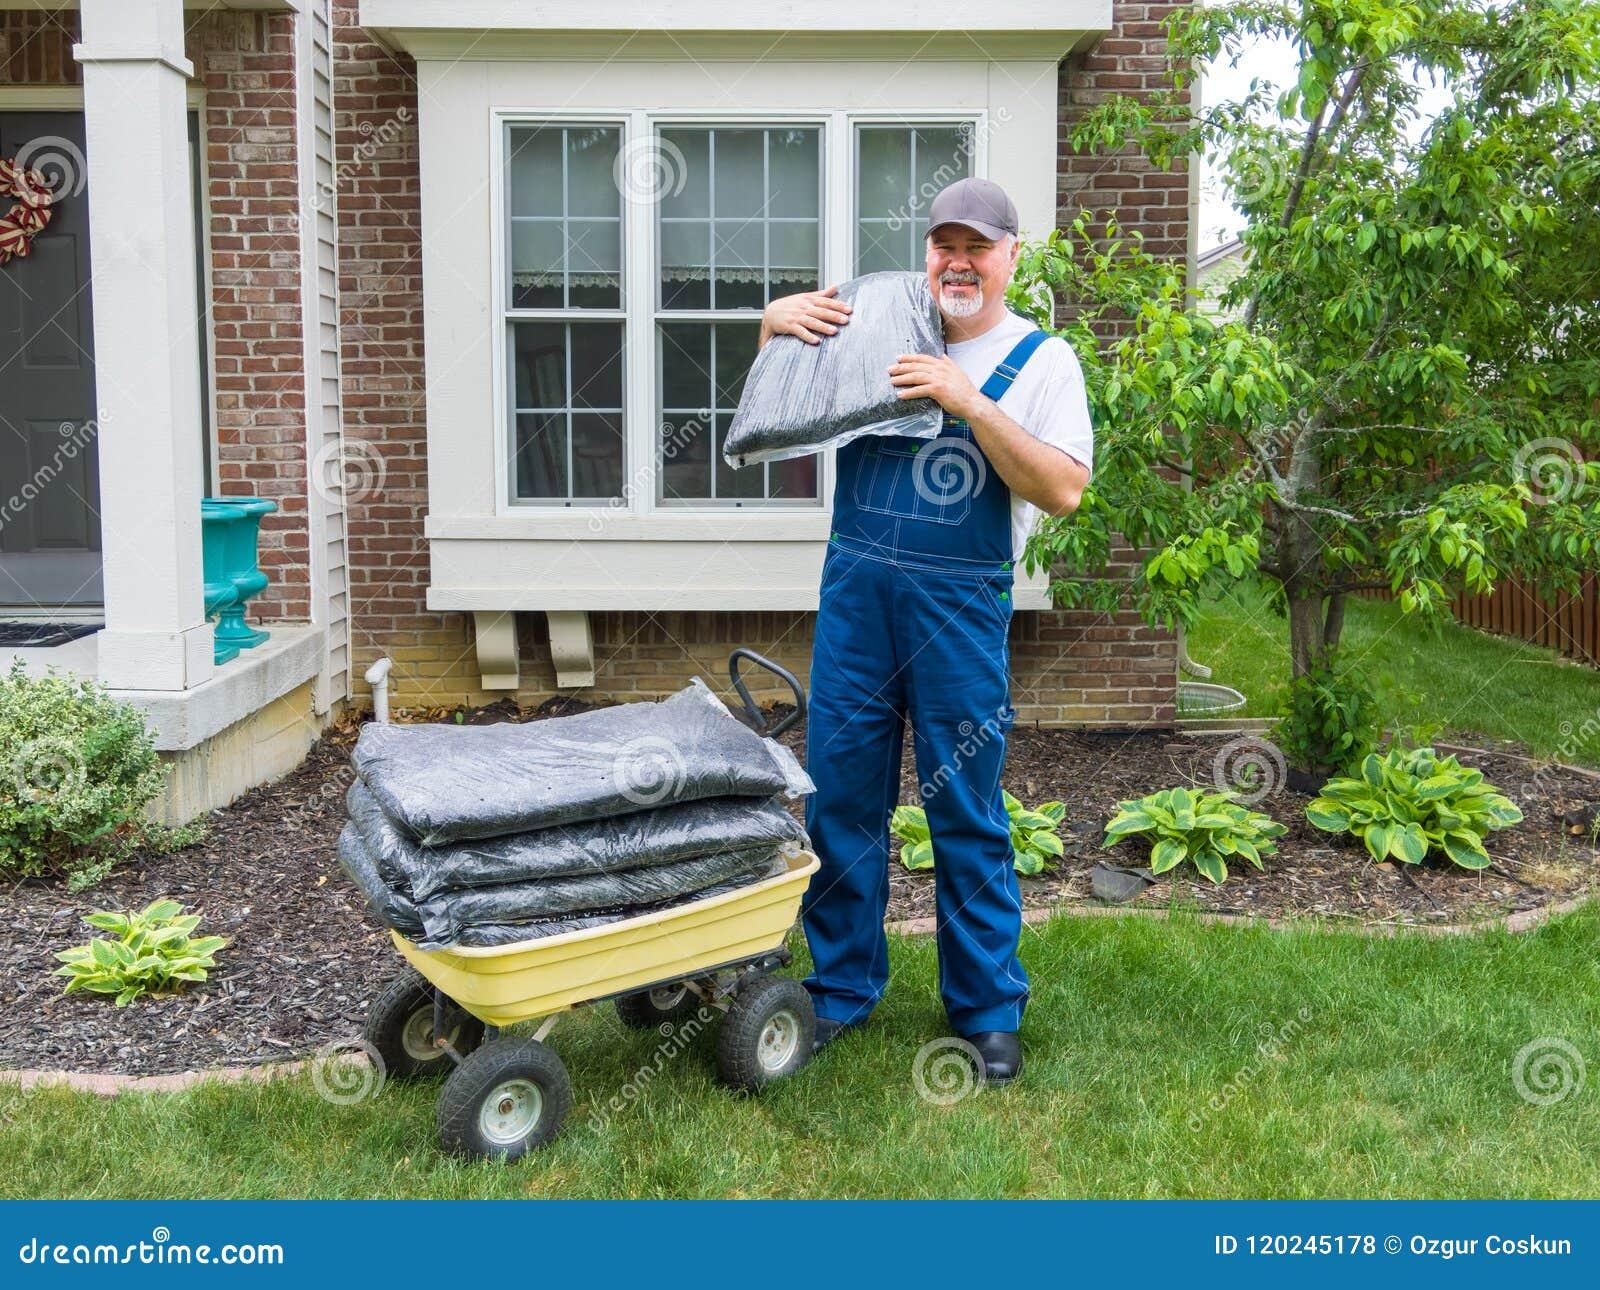 Man unloading bags of mulch from a wheelbarrow